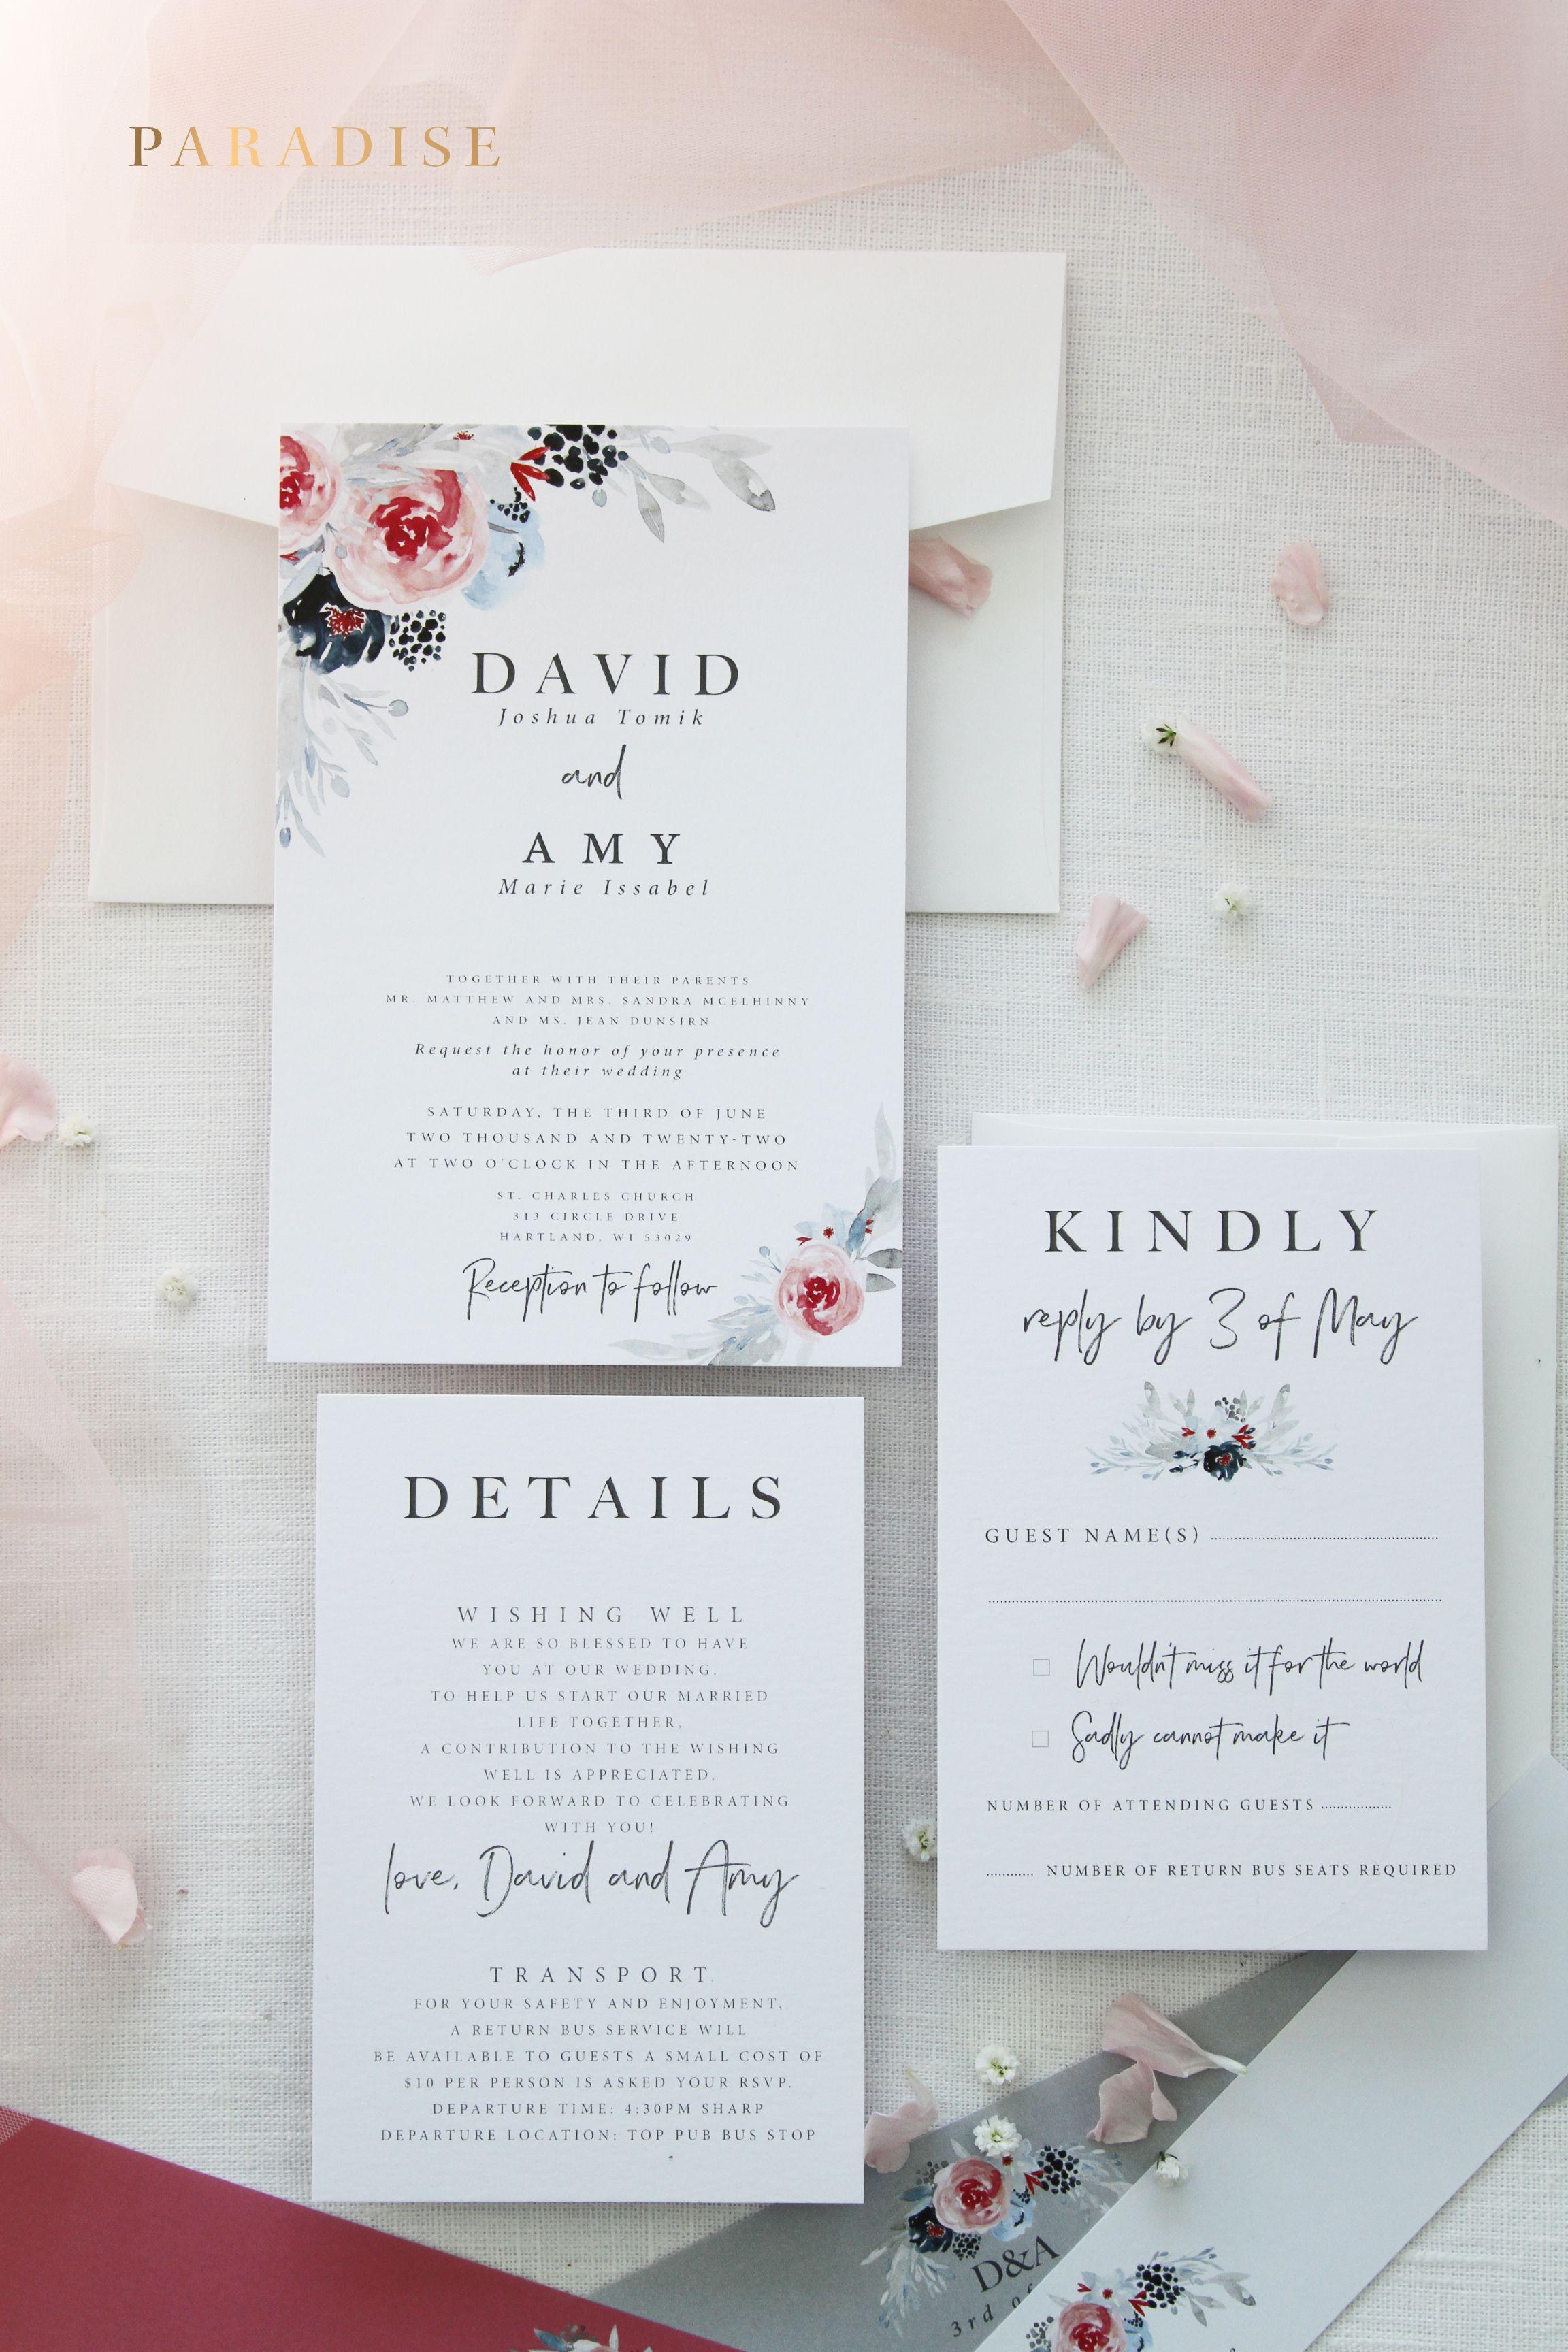 danica wedding invitation sets printable wedding invitations or printed wedding invitation sets watercolour flowers - Printed Wedding Invitations